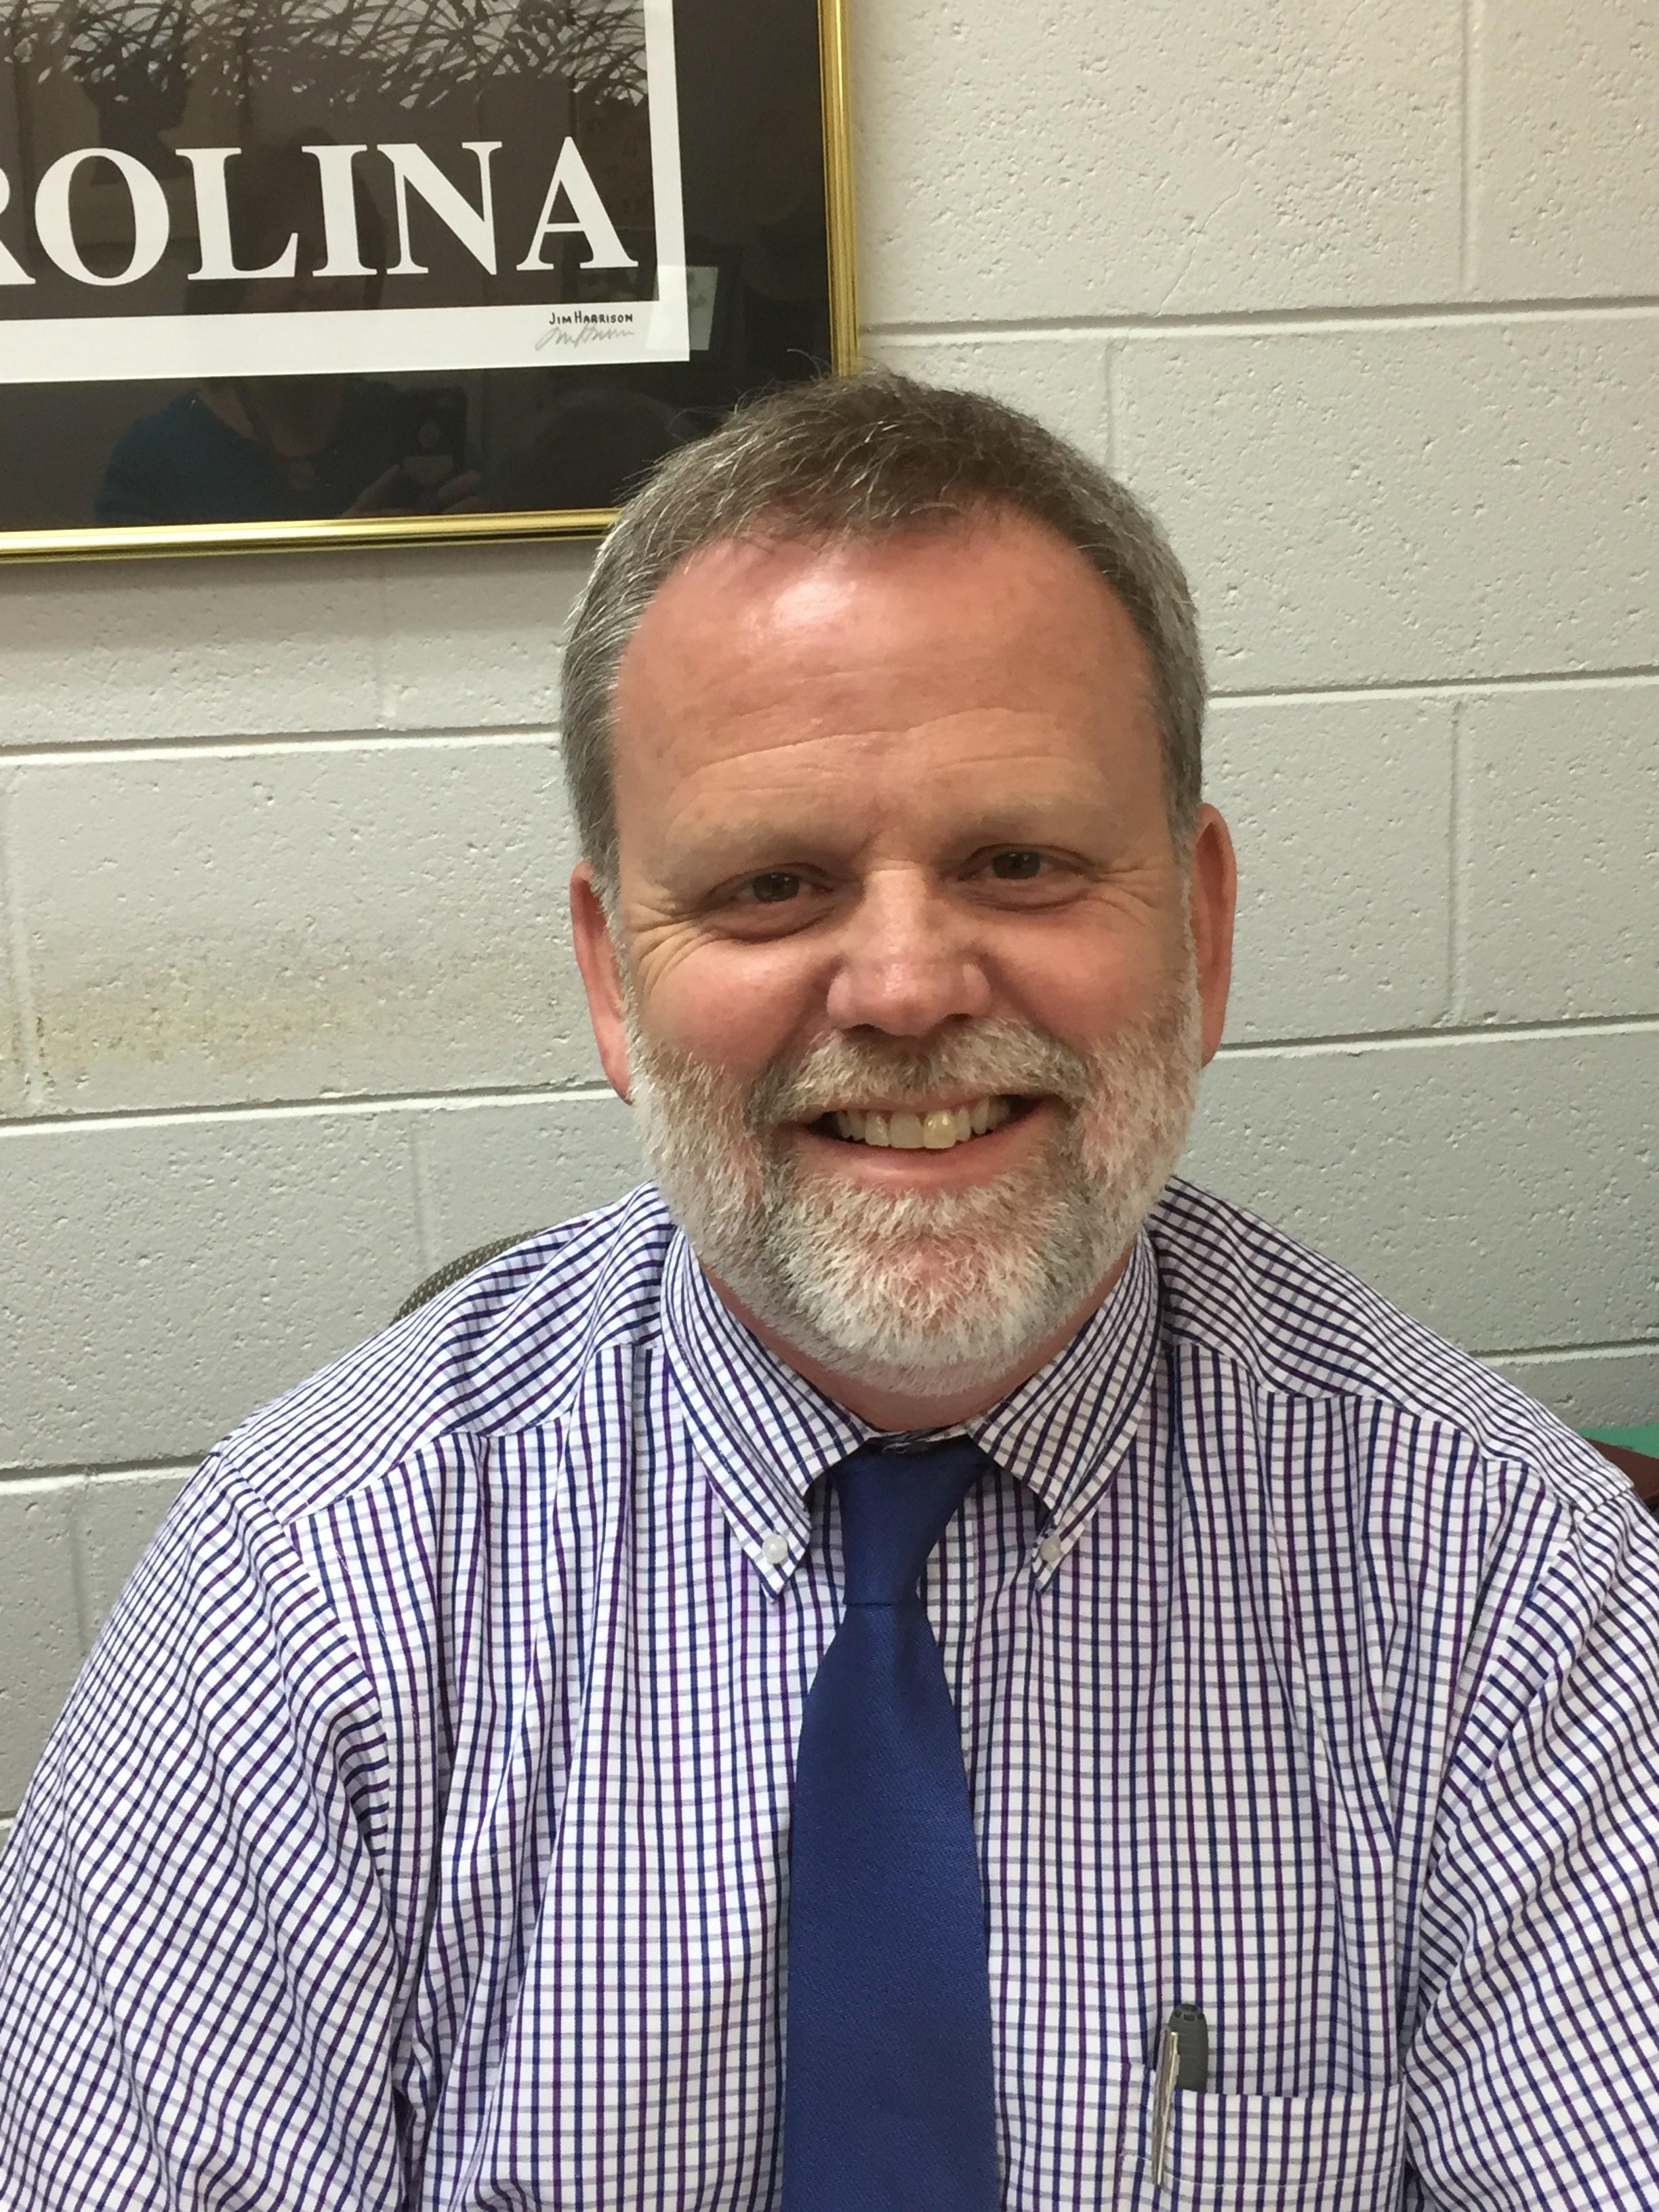 David Sims, Principal